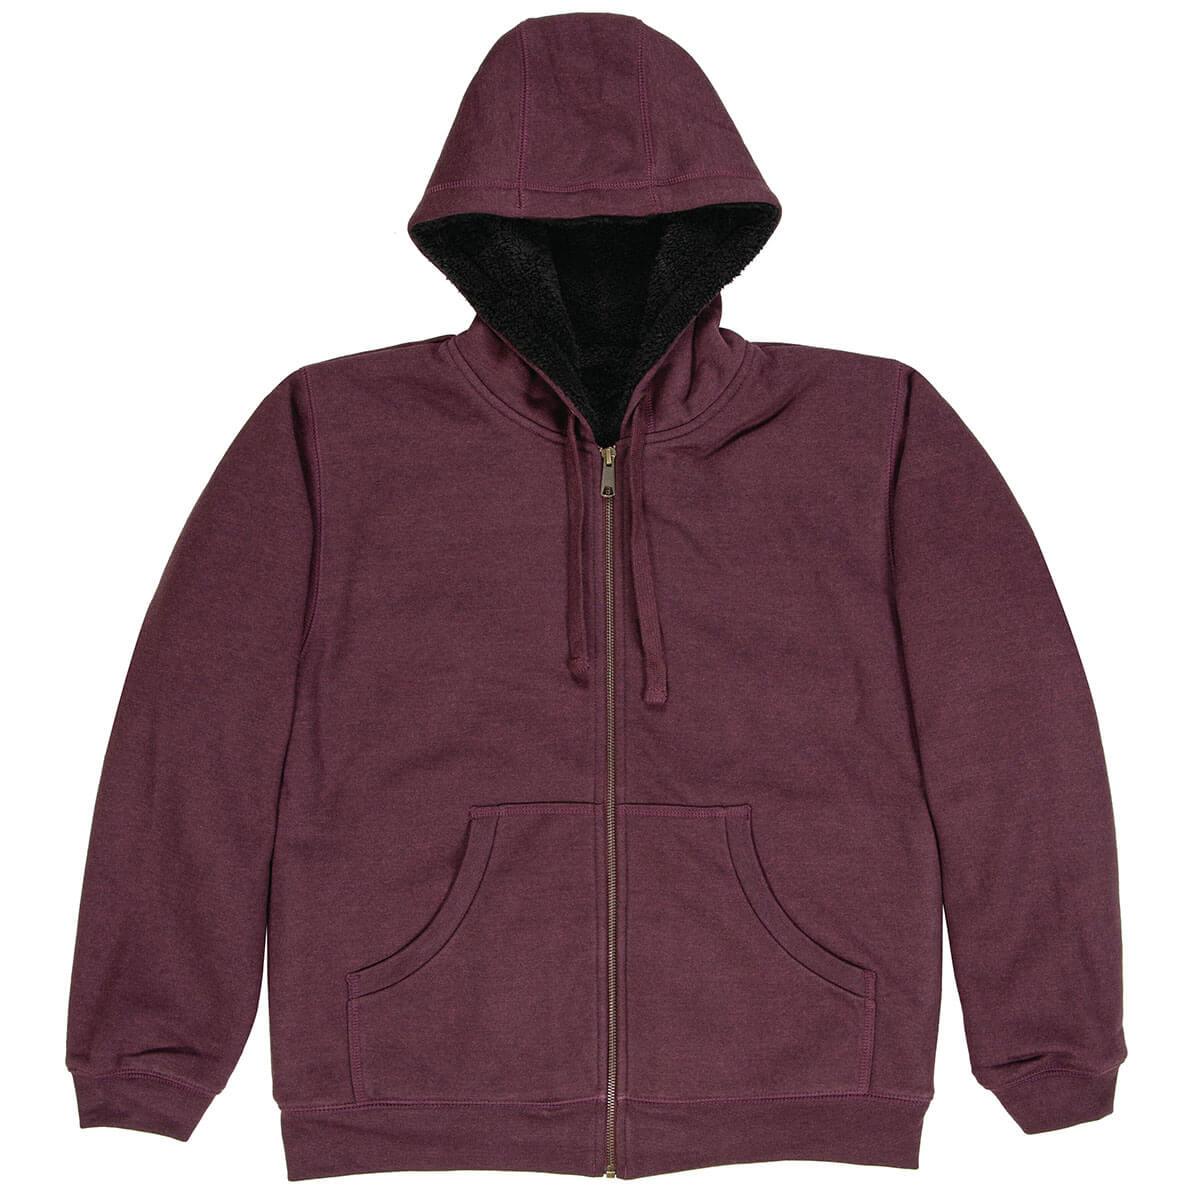 Women's Everest Hooded Sweatshirt - Cabernet - S